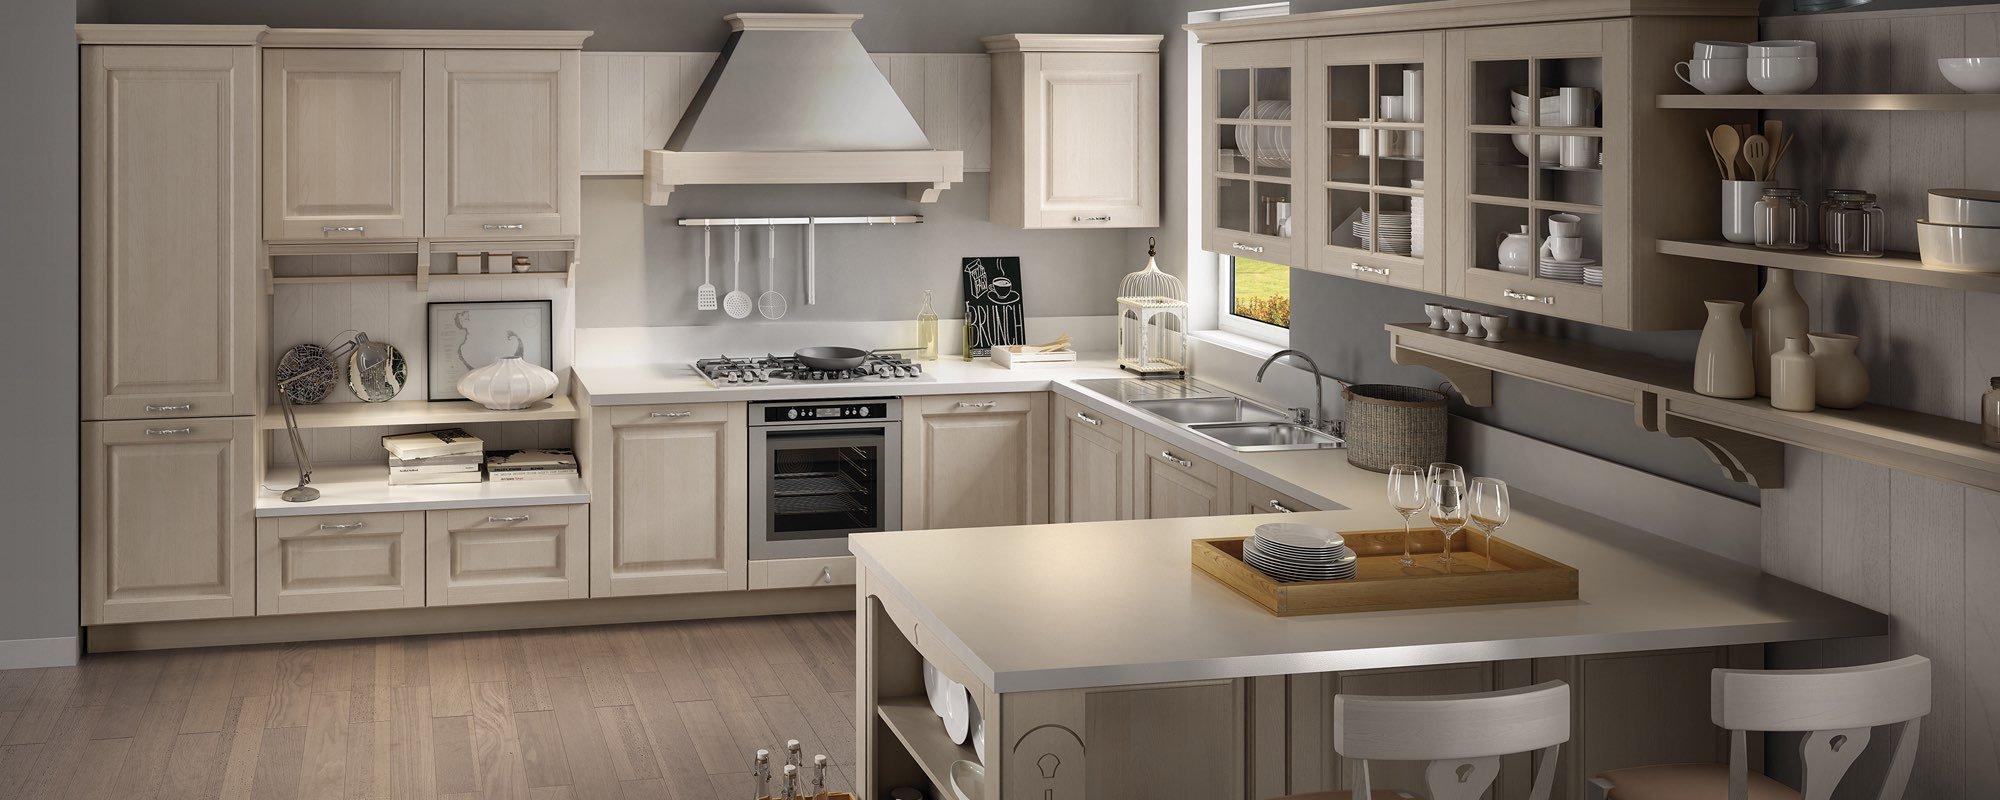 cucina stosa classica - modello cucina bolgheri